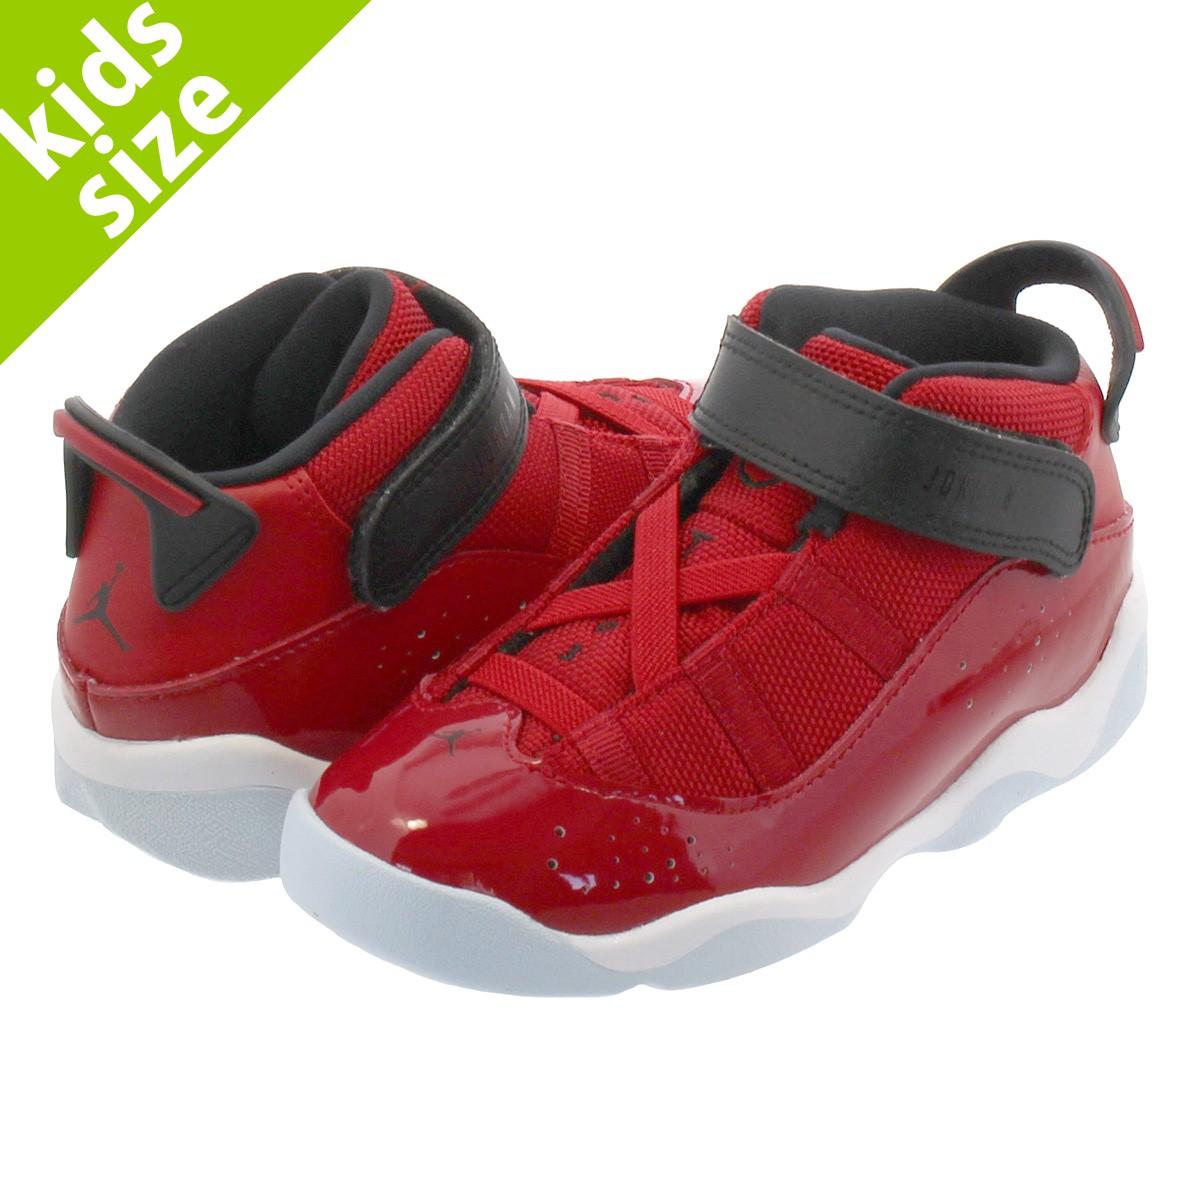 Jordan 6 Rings Gym Red//Black-White 323420 601 TD